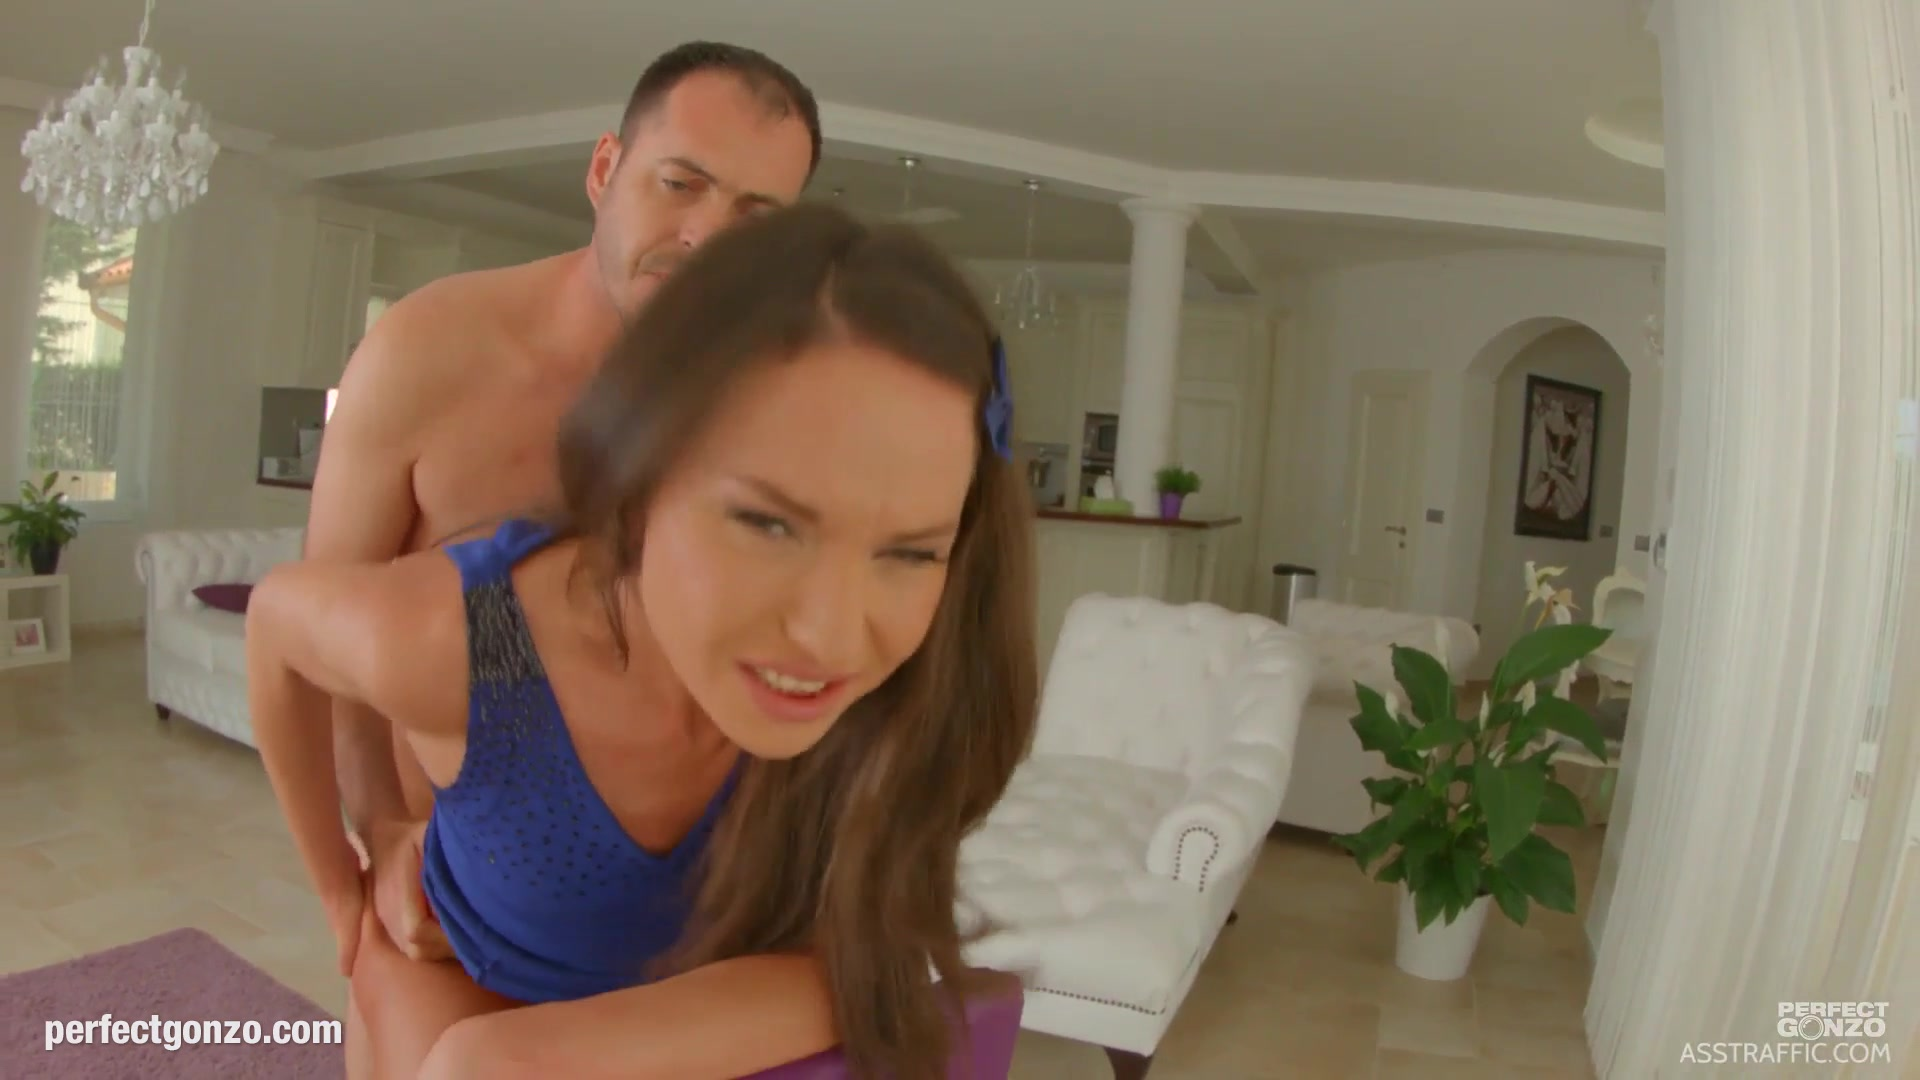 Men who love big women Adult Videos